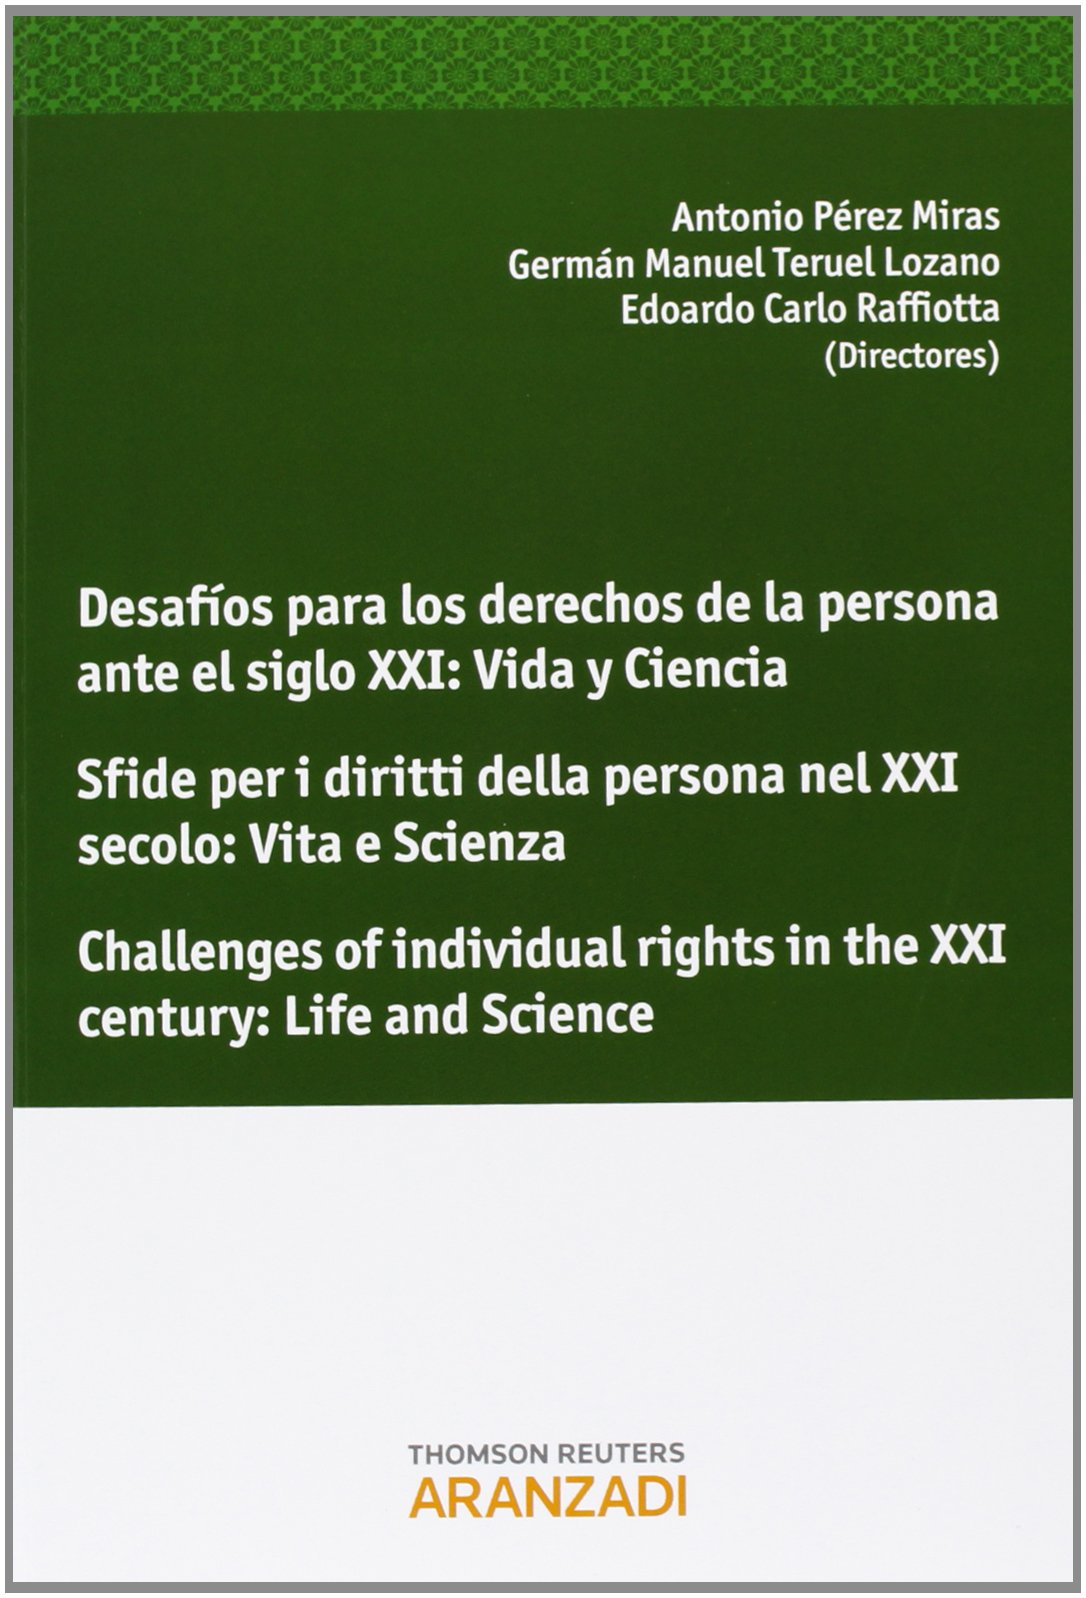 Read Online DESAFÃ?OS PARA LOS DERECHOS DE LA PERSONA ANTE EL SIGLO XXI: VIDA Y CIENCIA. SFIDE PER I DIRITTI DELLA PERSONA NEL XXI SECOLO: VITA E SCIENZA. CHALLENGES OF INDIVIDUAL RIGHTS IN THE XXI CENTURY: LIFE A PDF